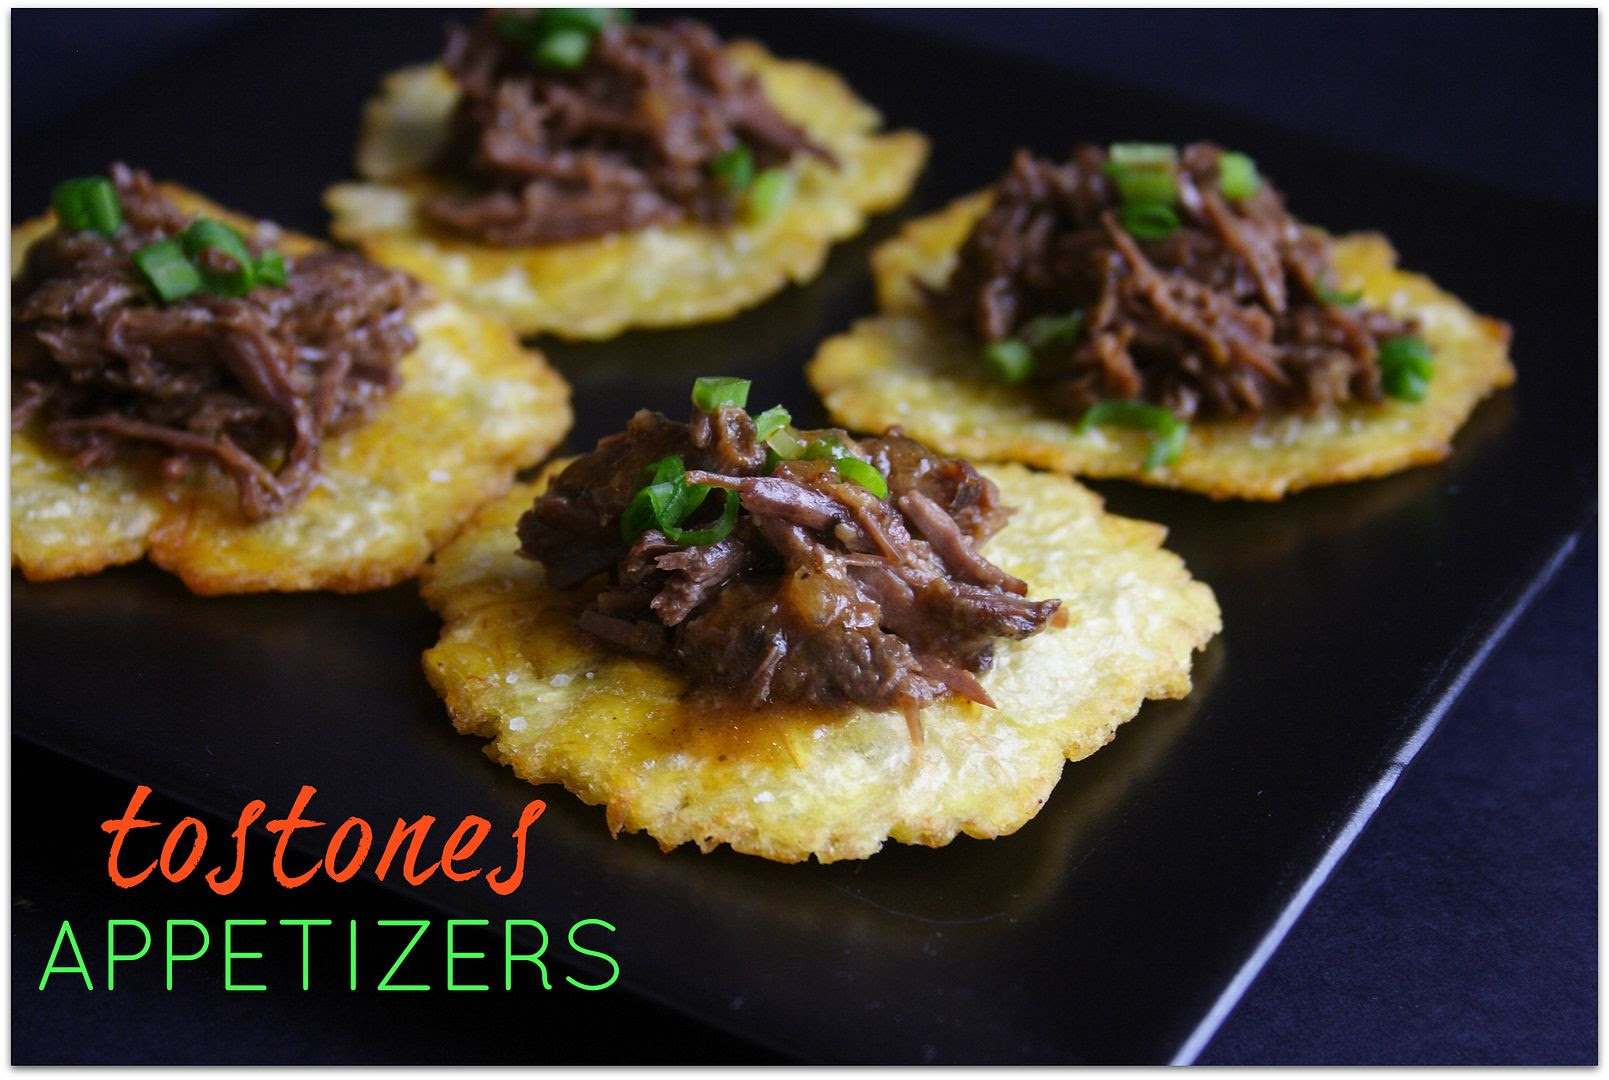 Tostones Appetizers